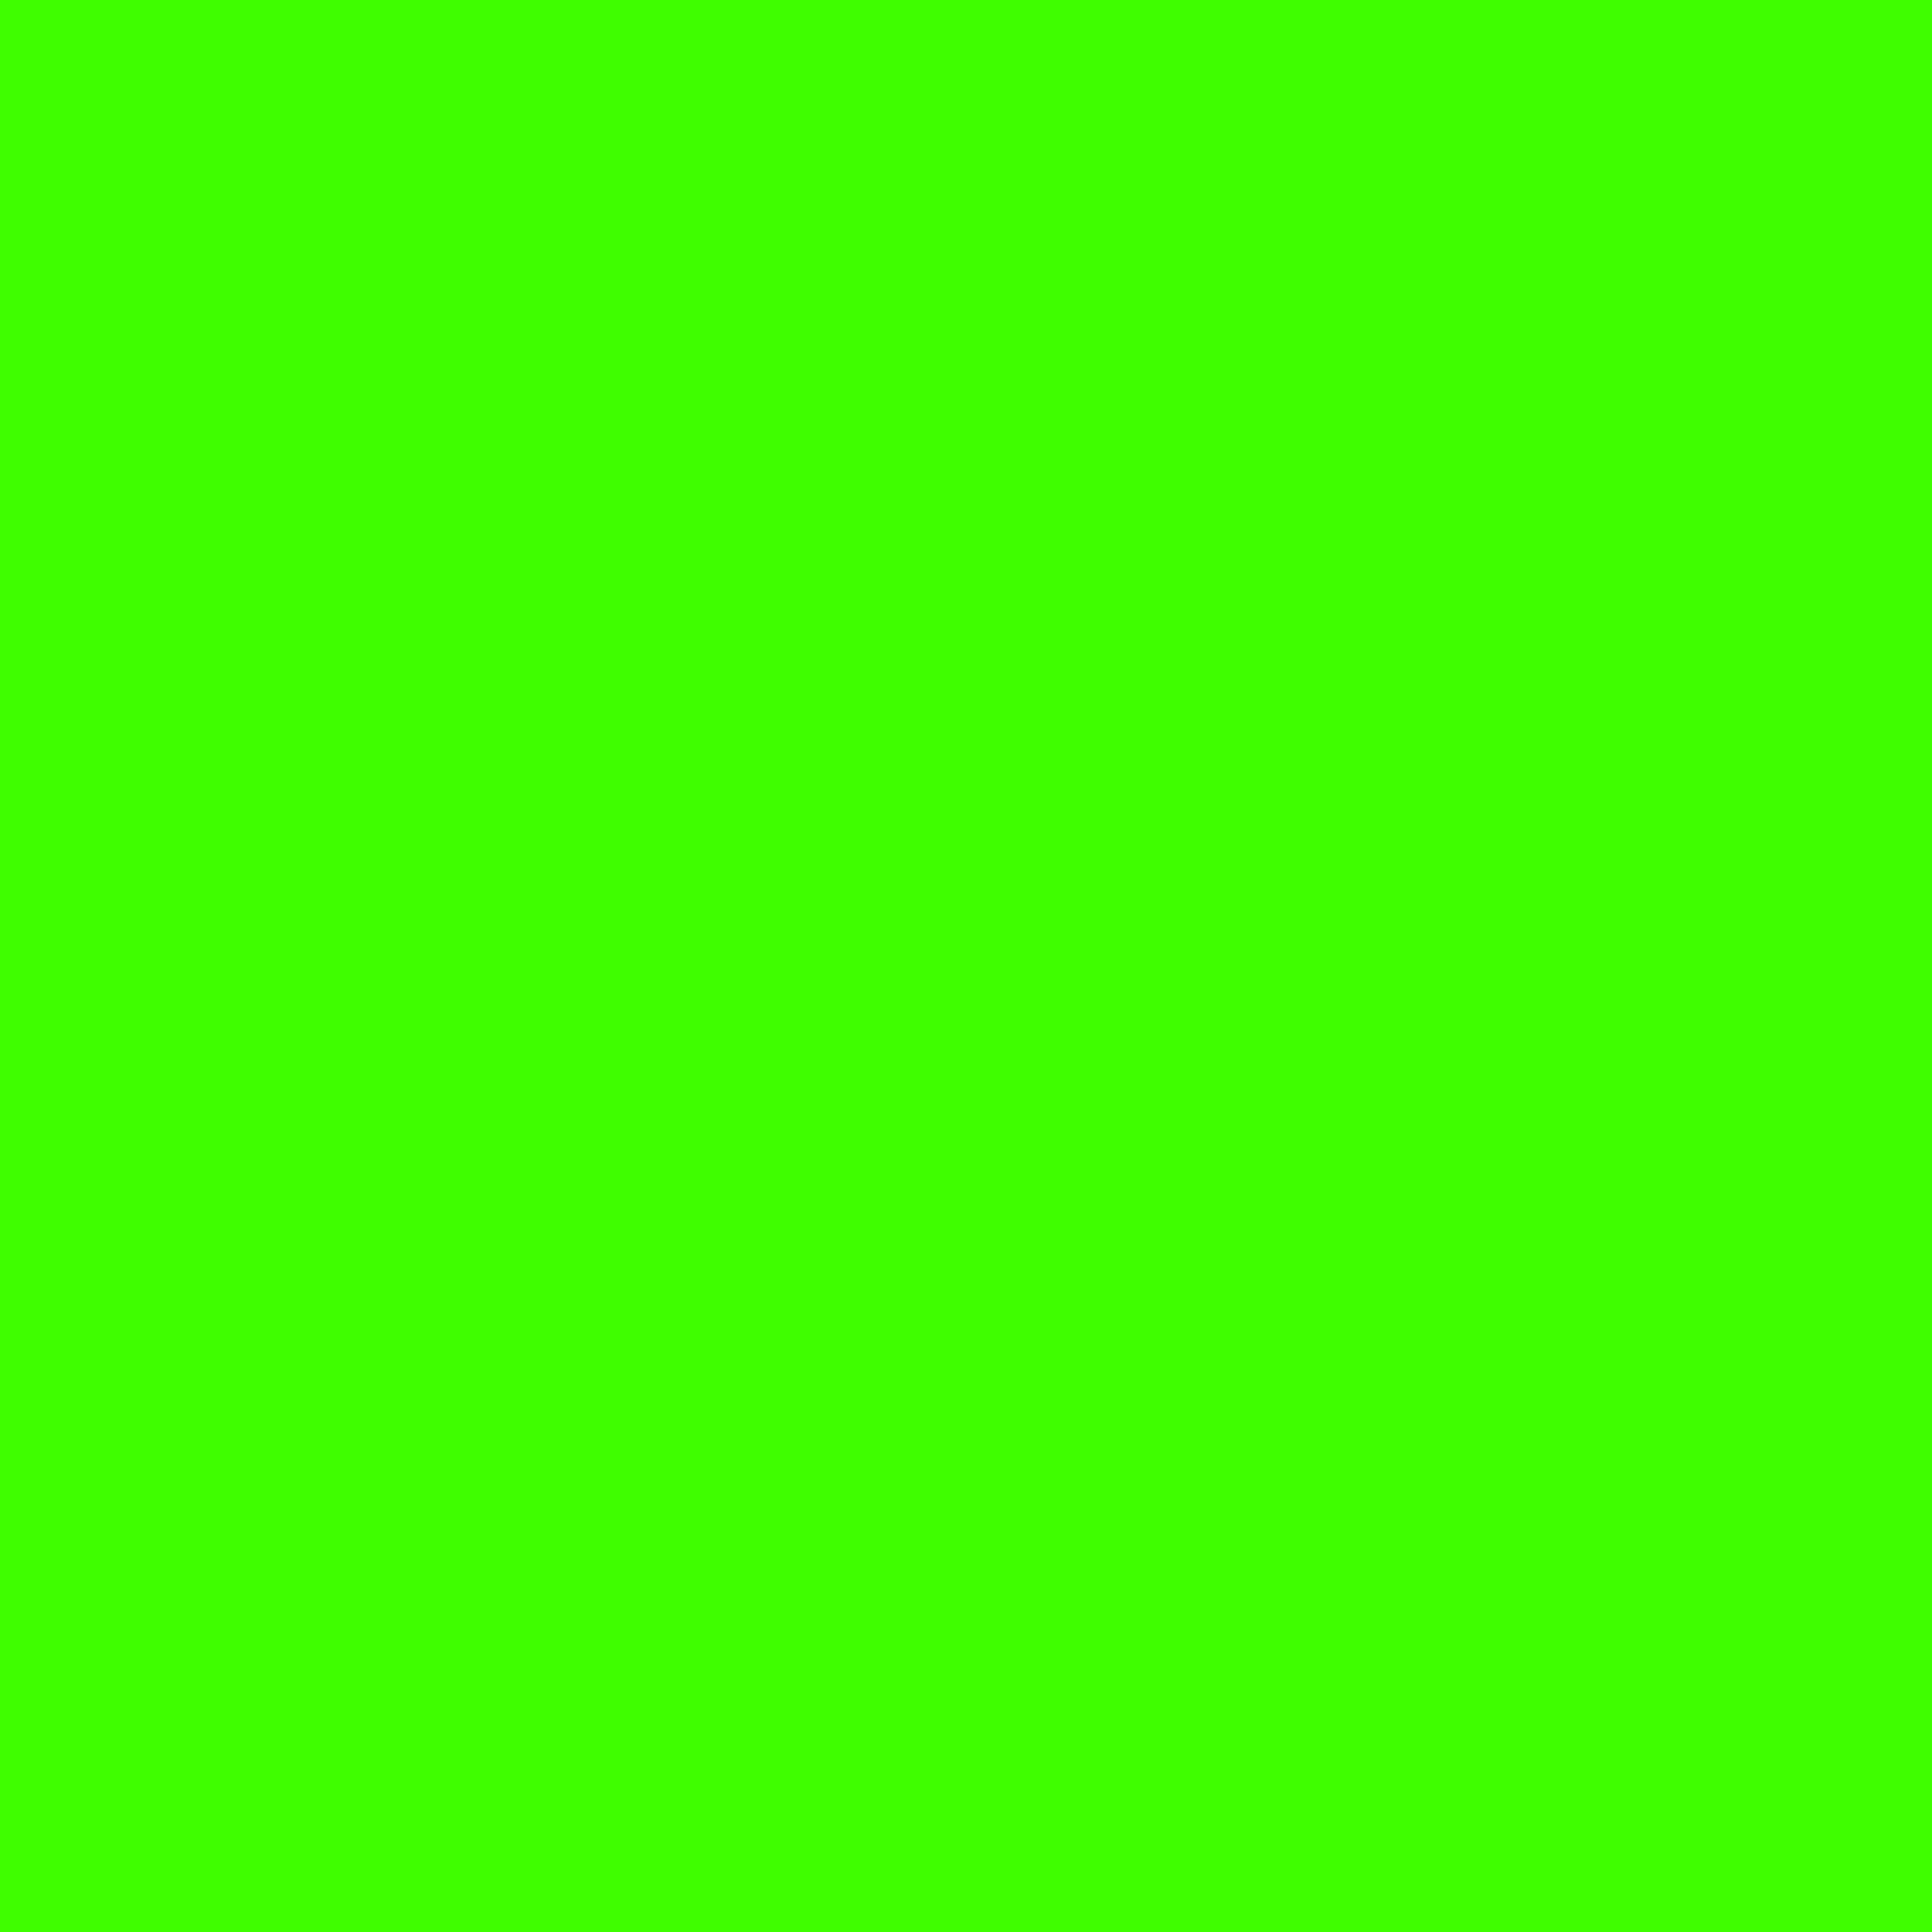 3600x3600 Harlequin Solid Color Background